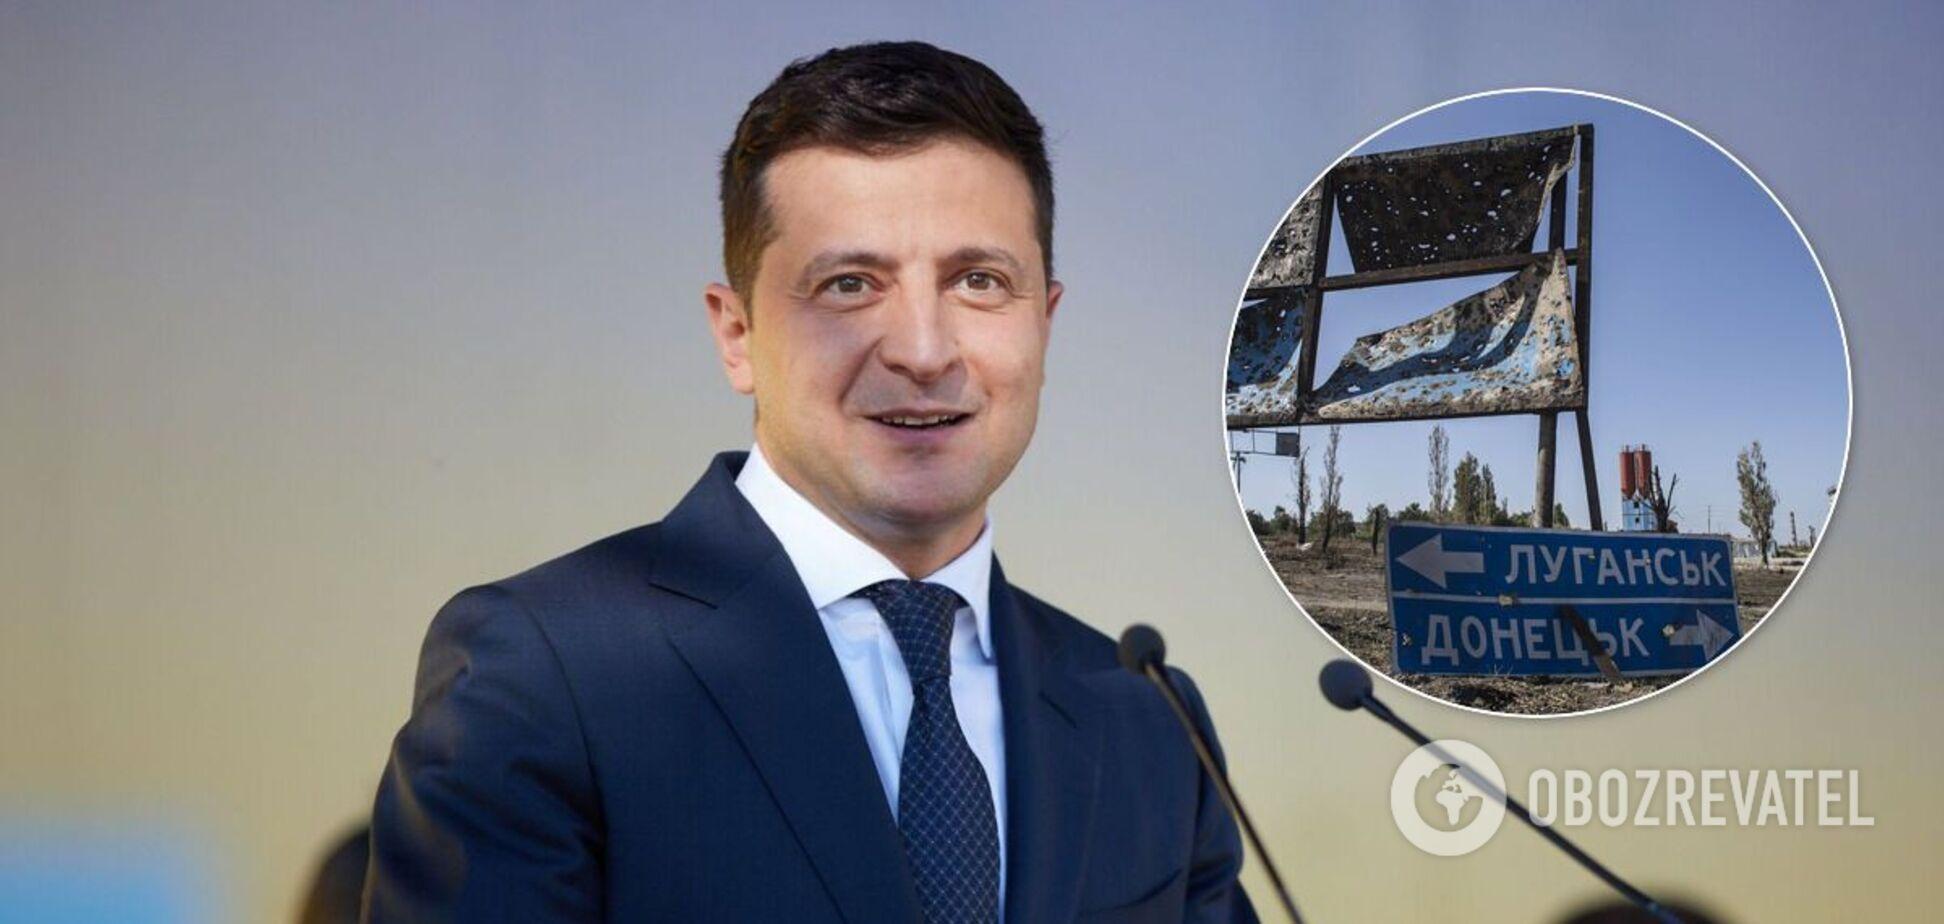 Президент отправился на Донбасс